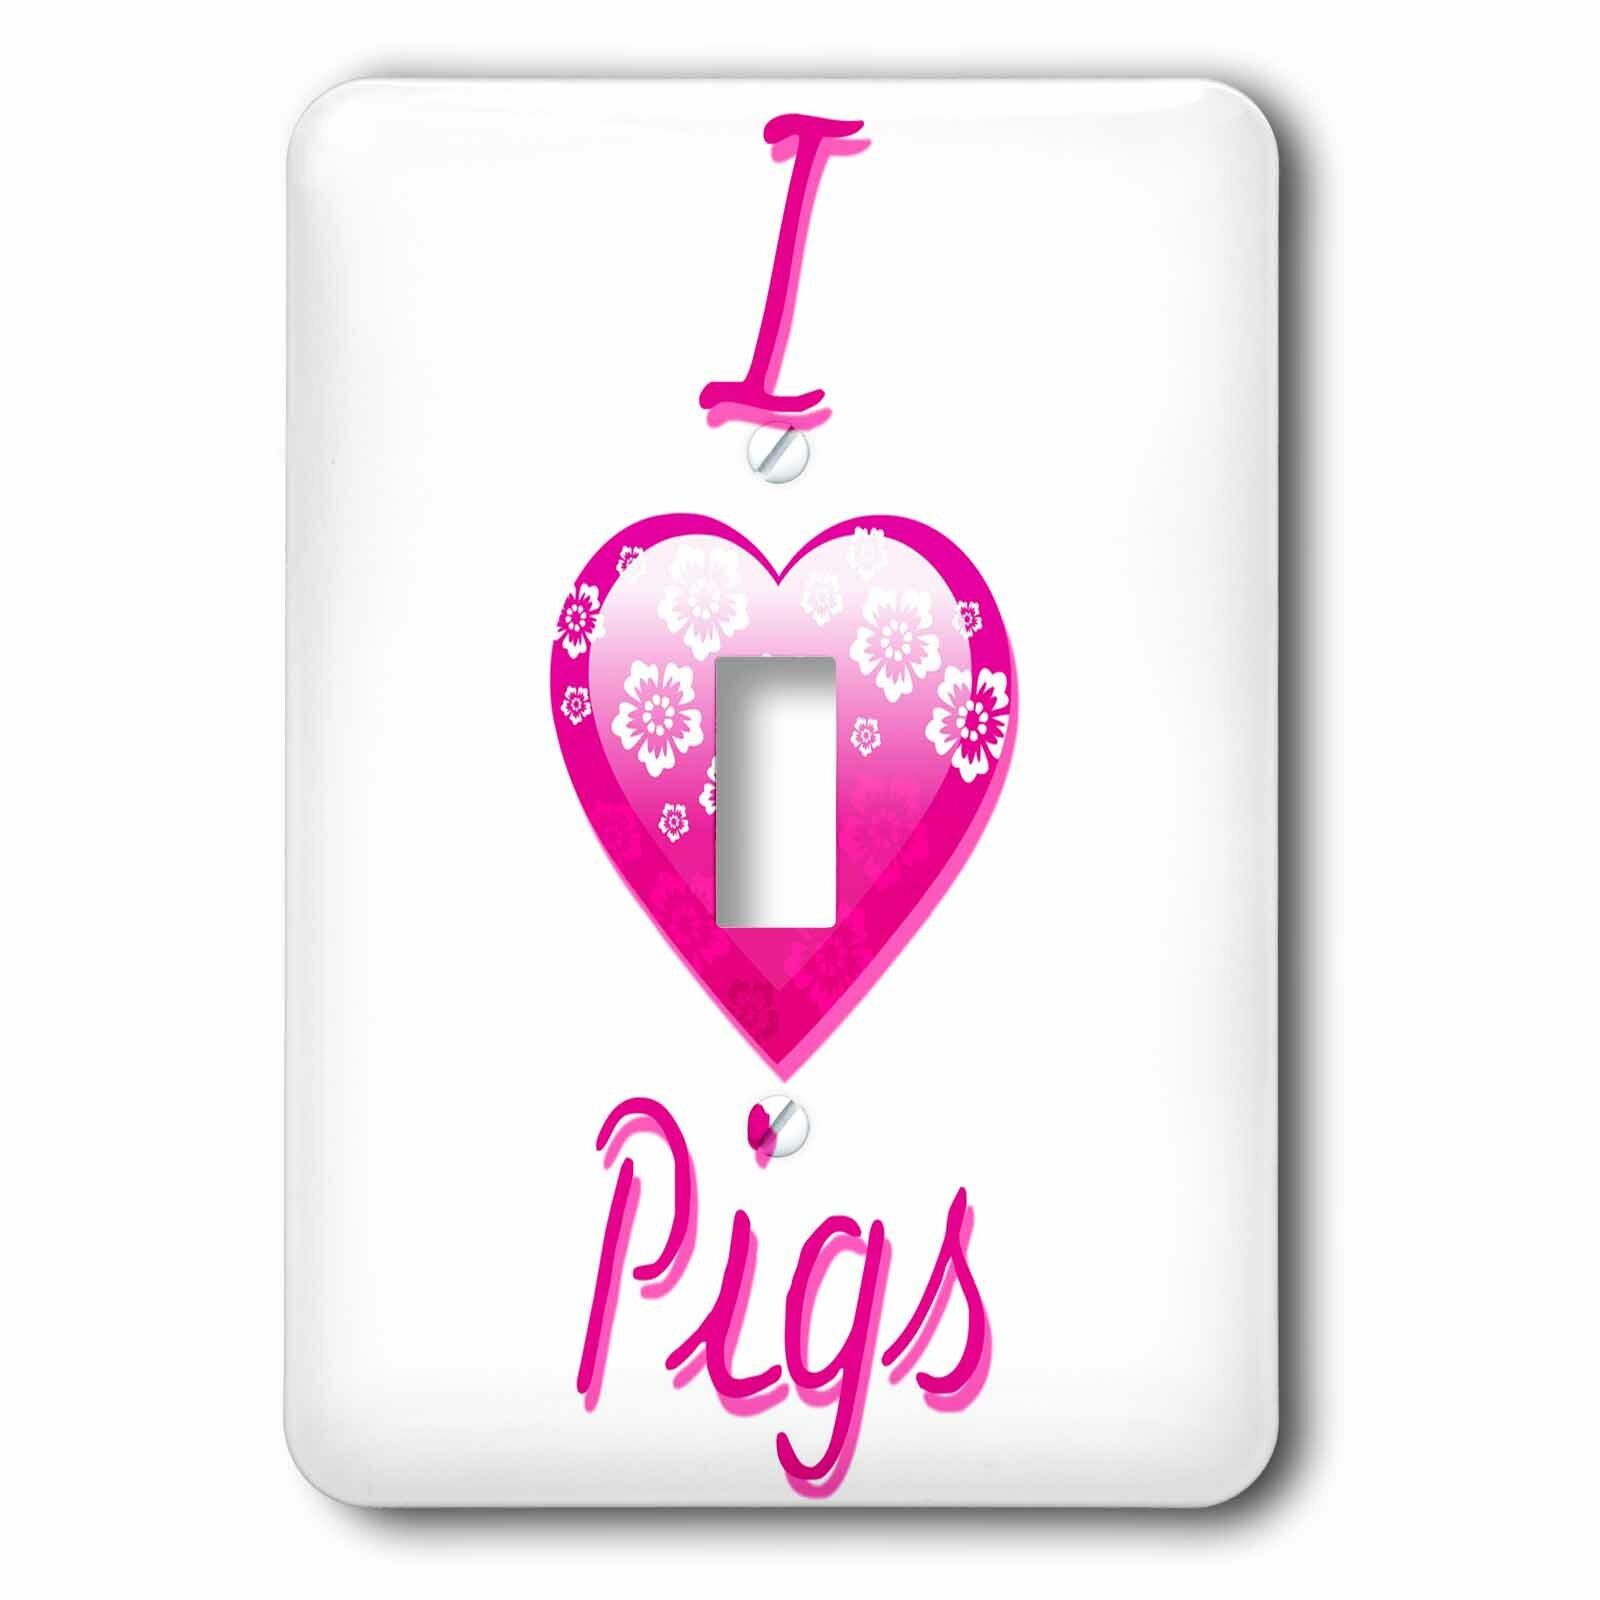 3drose I Love Pigs 1 Gang Toggle Light Switch Wall Plate Wayfair